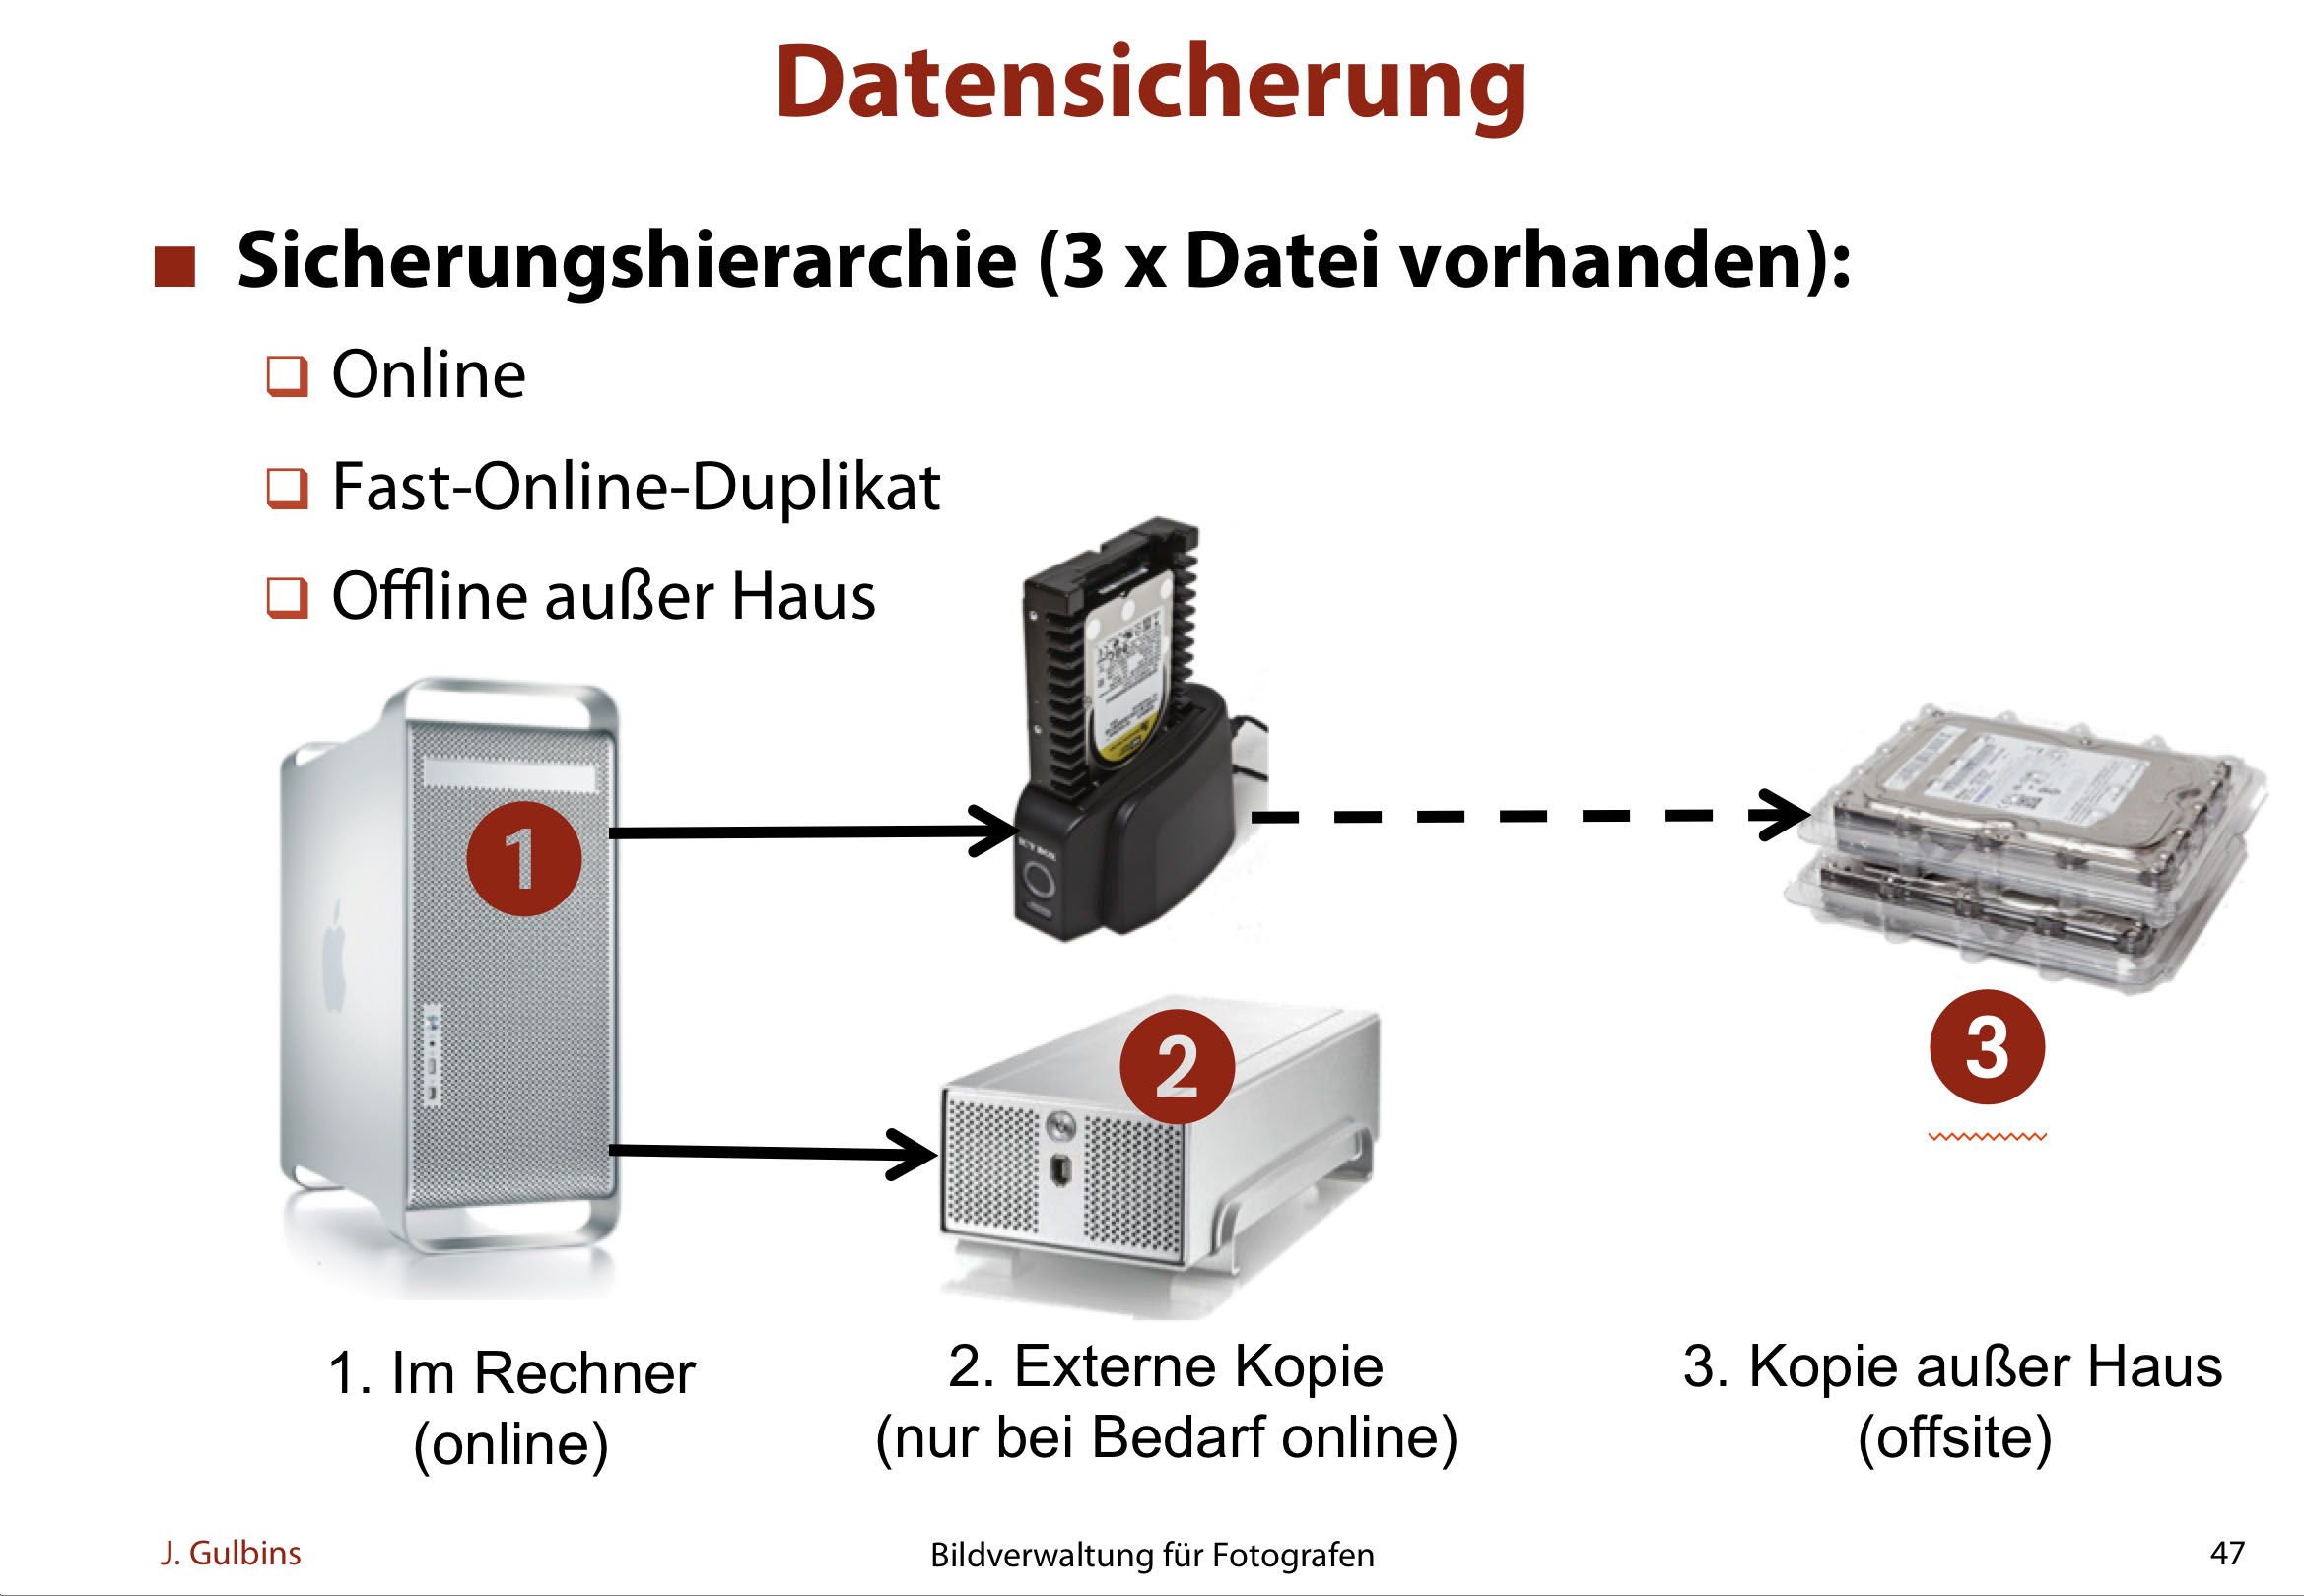 Datensichwerung.jpg